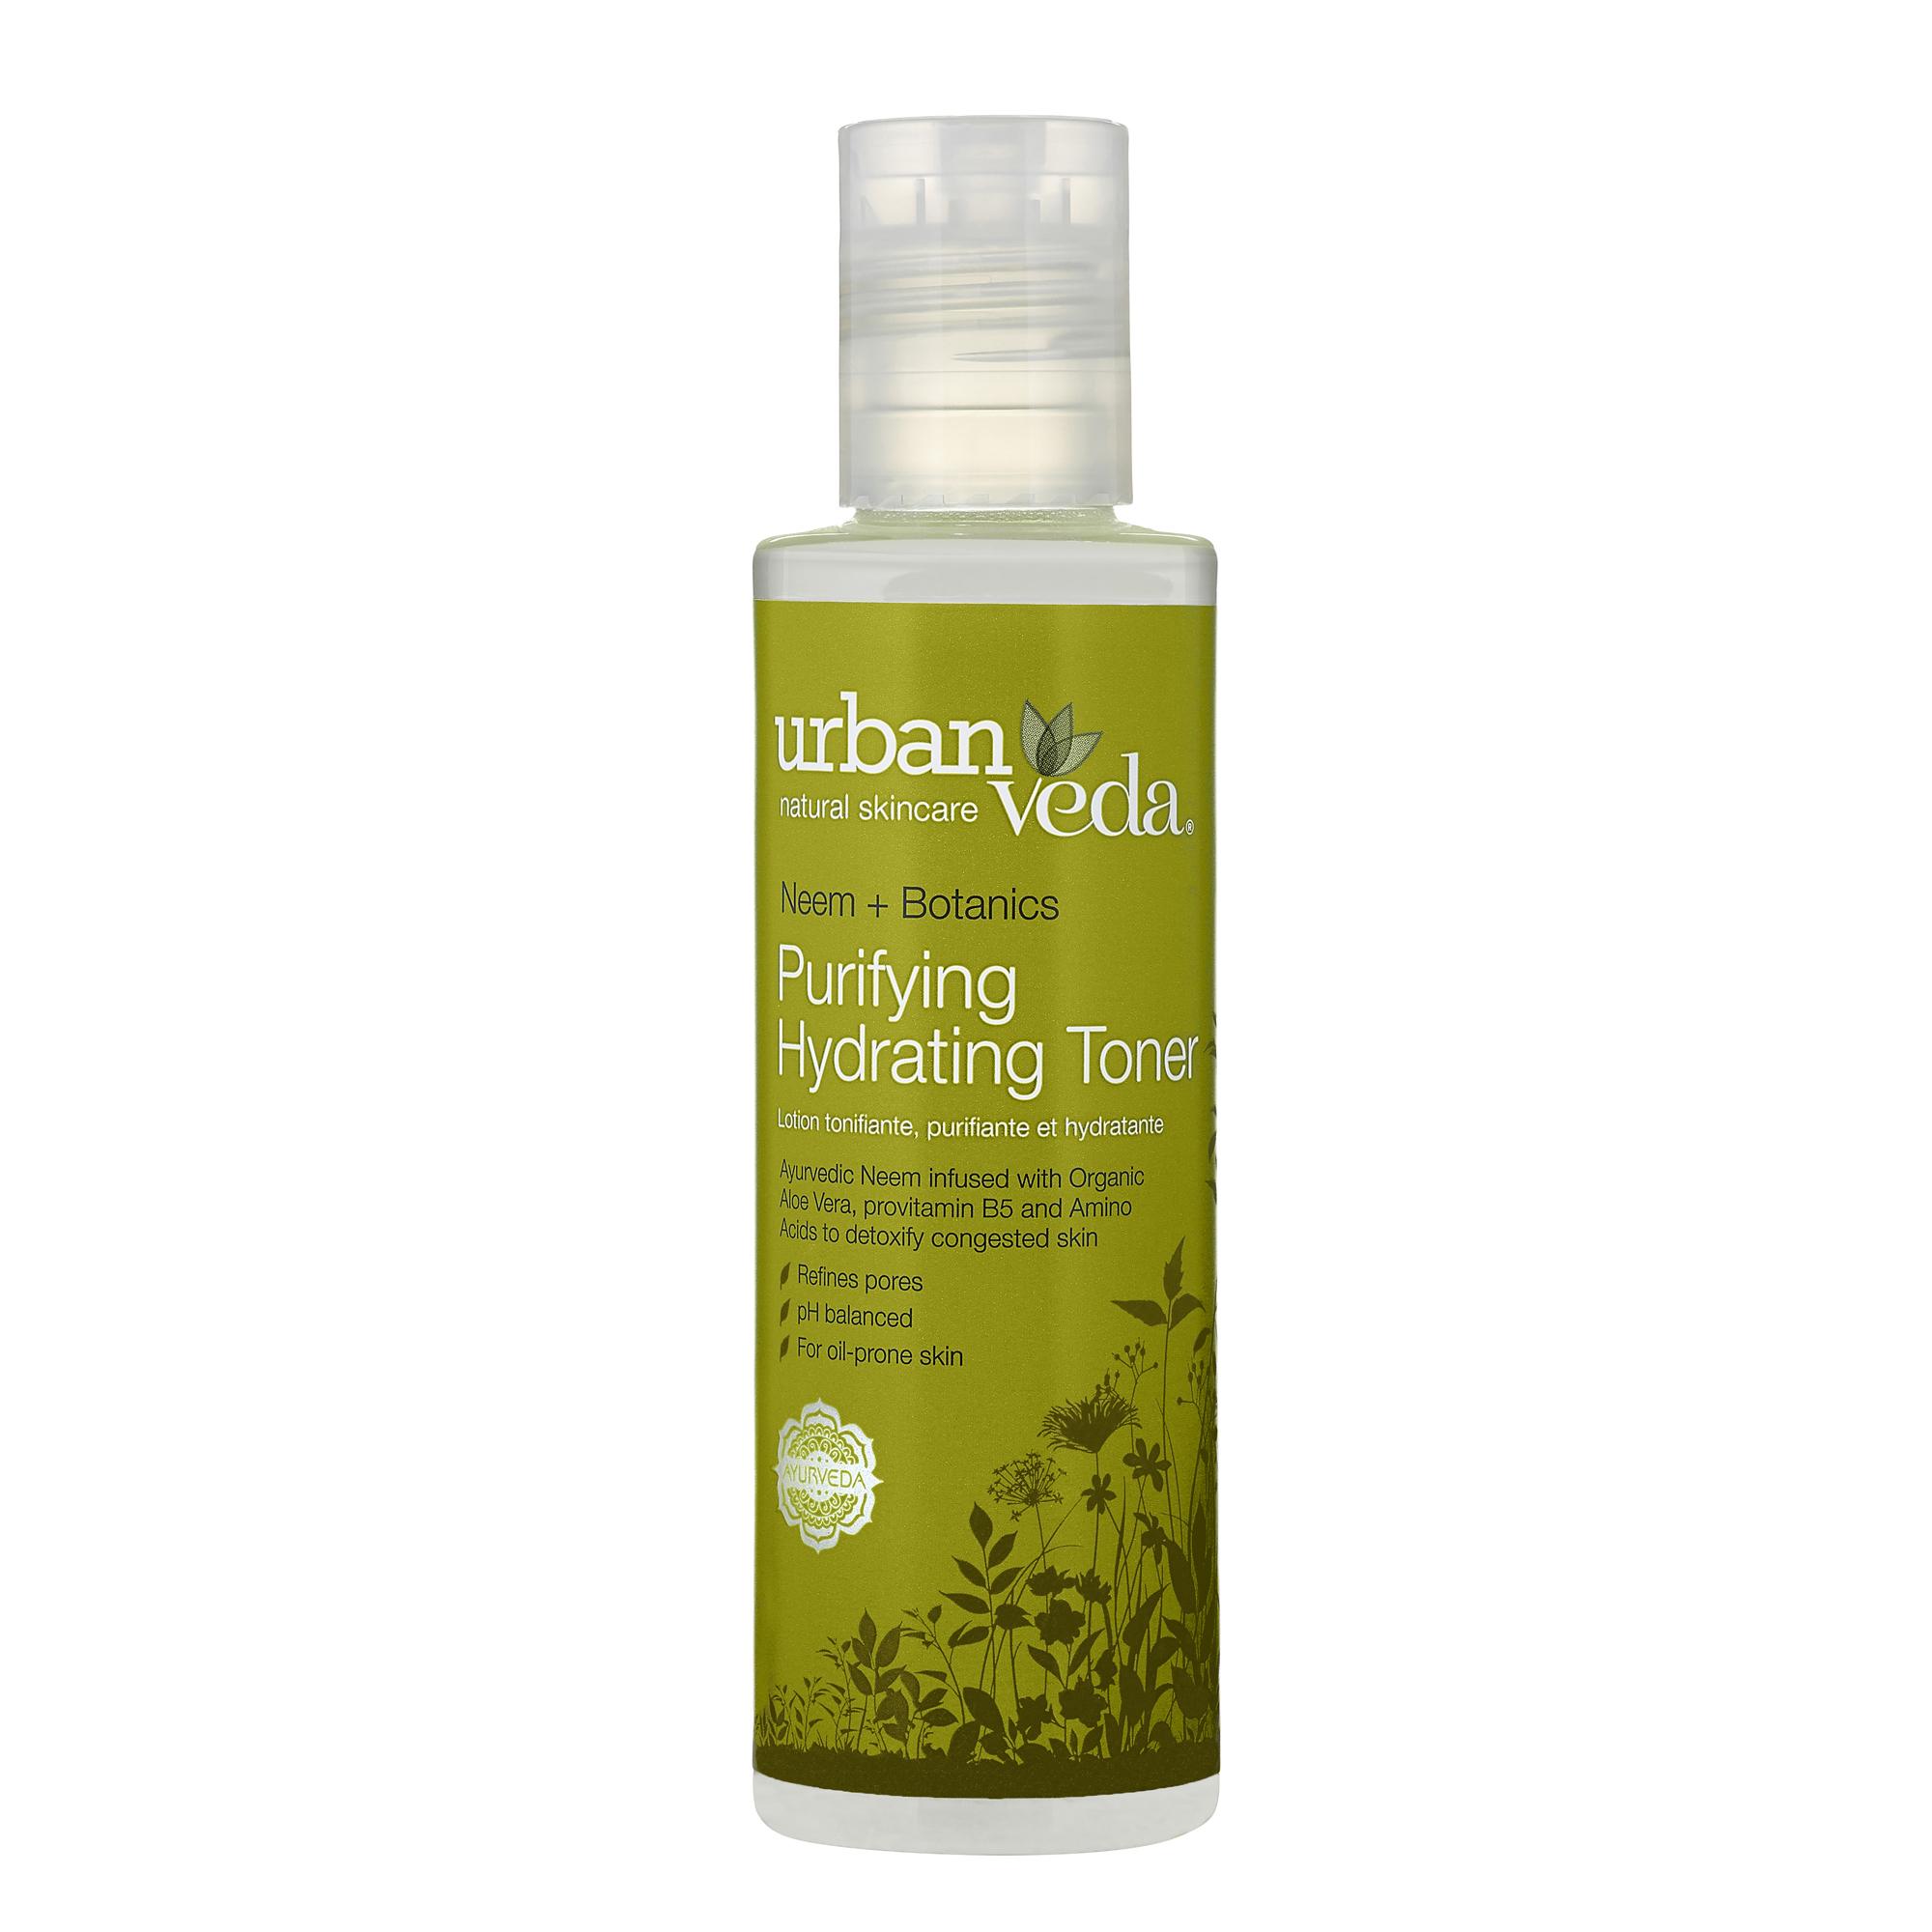 Urban Veda | Urban Veda Purifying Hydrating Toner 150ml